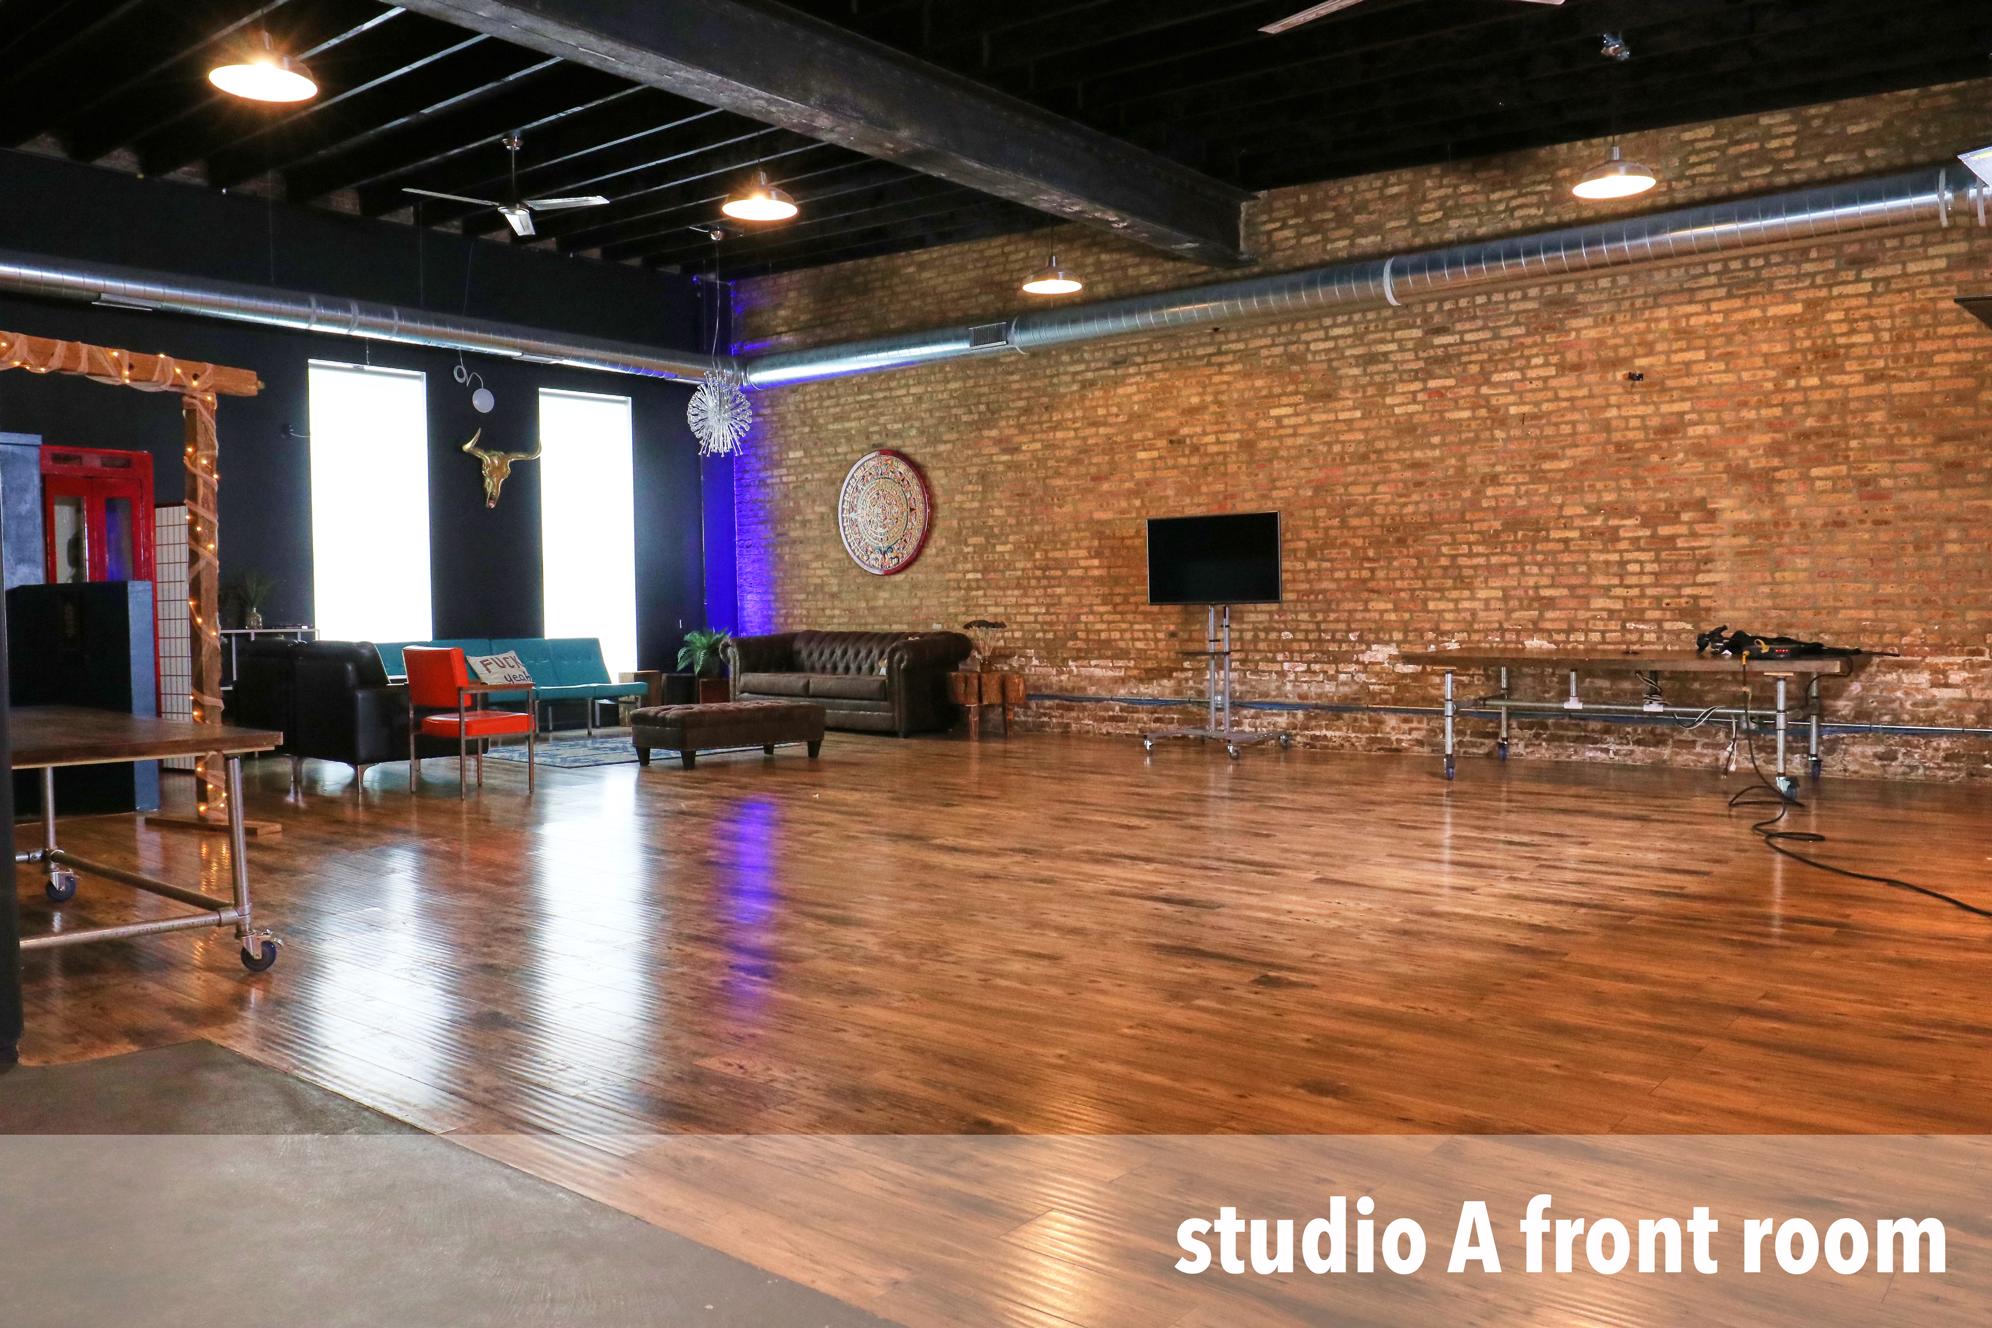 studio-A-front-room.png